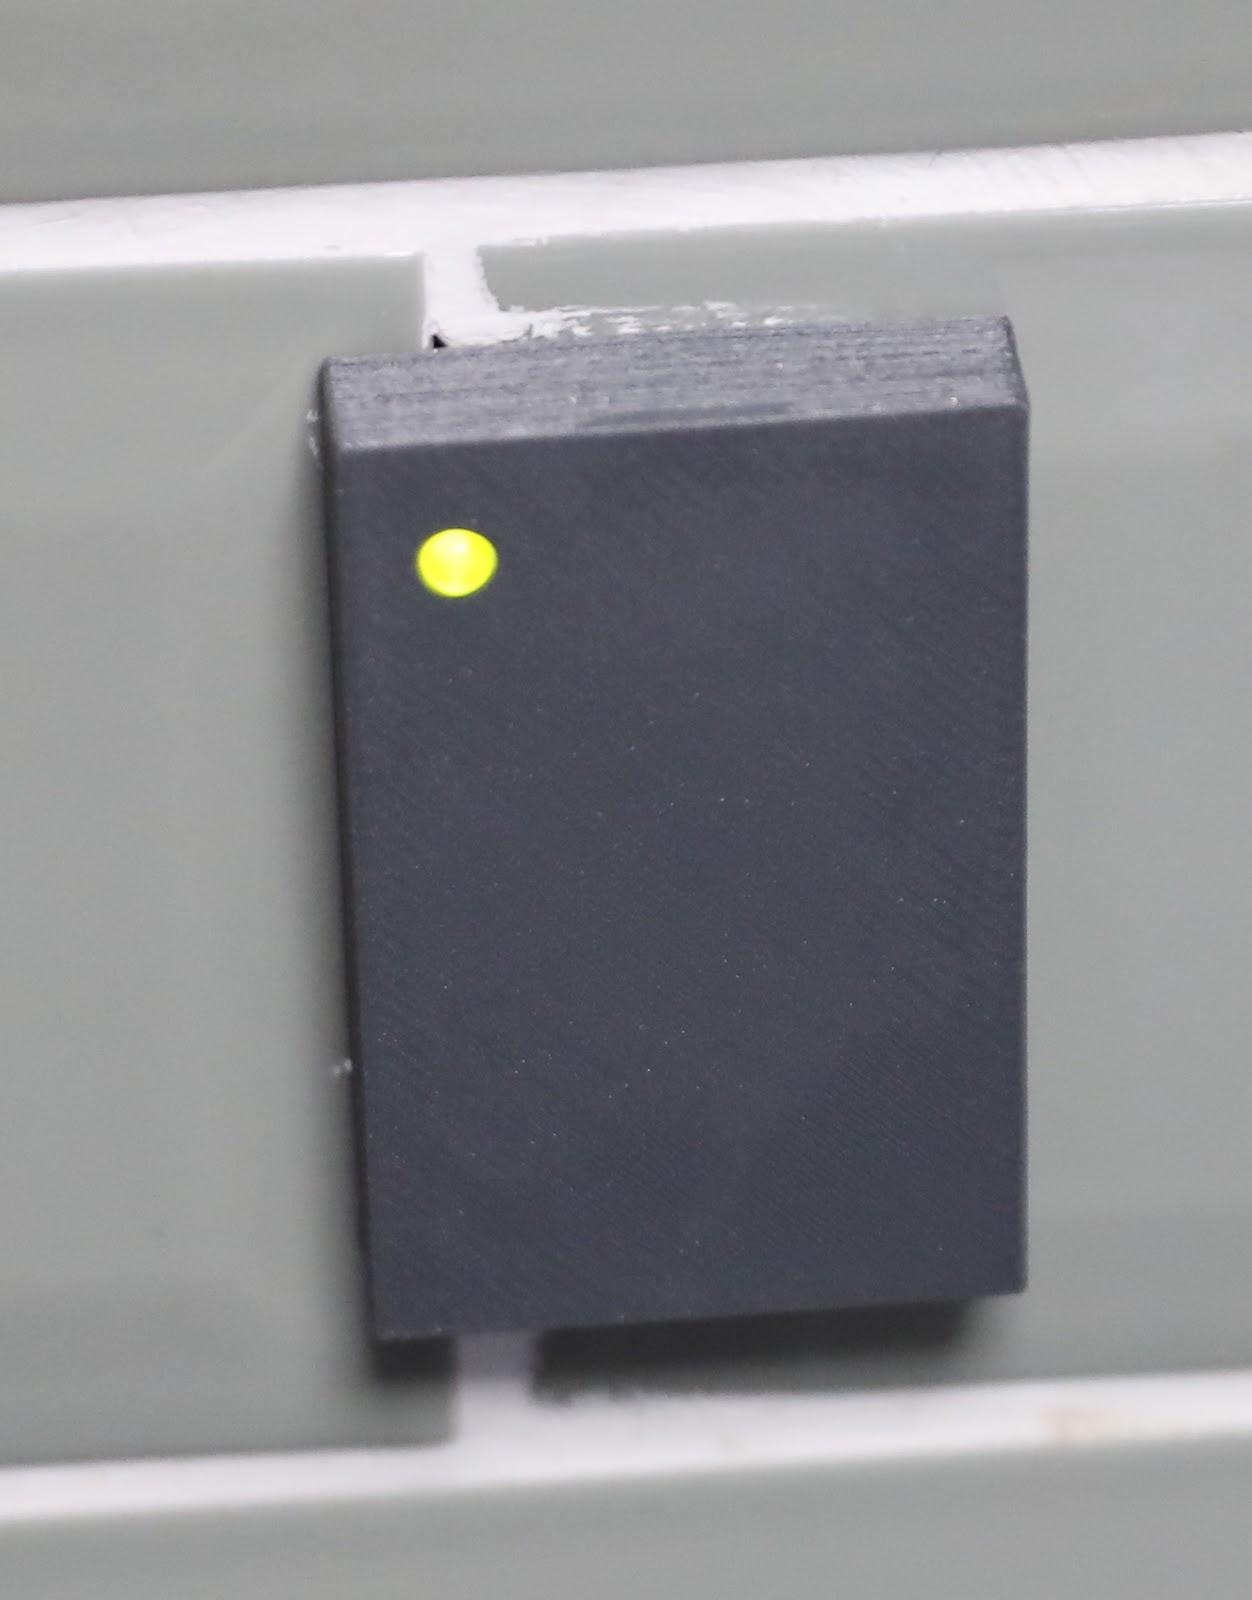 RevK®'s rants: Door entry system